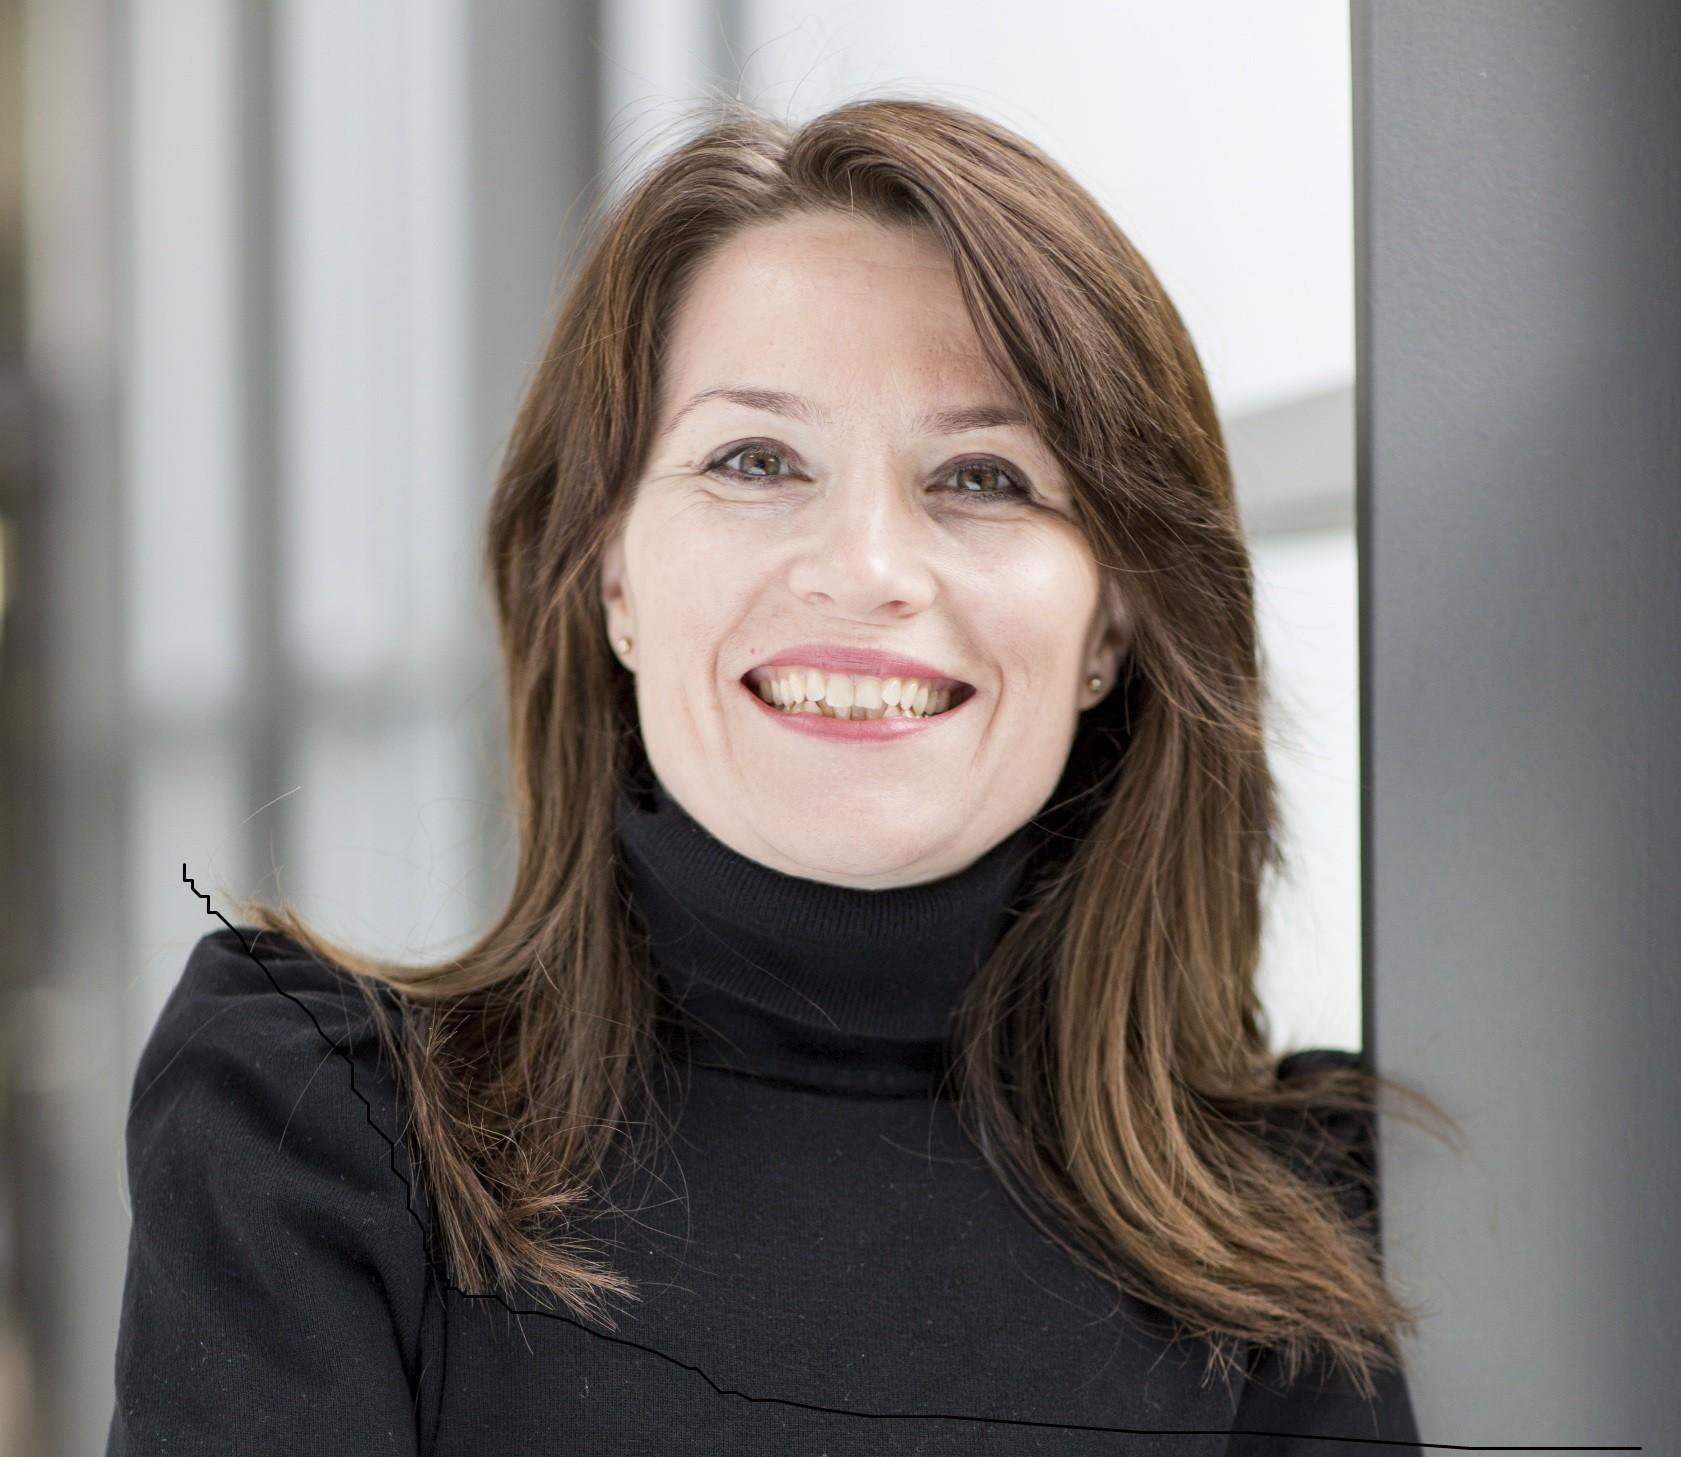 Silke Hansberg